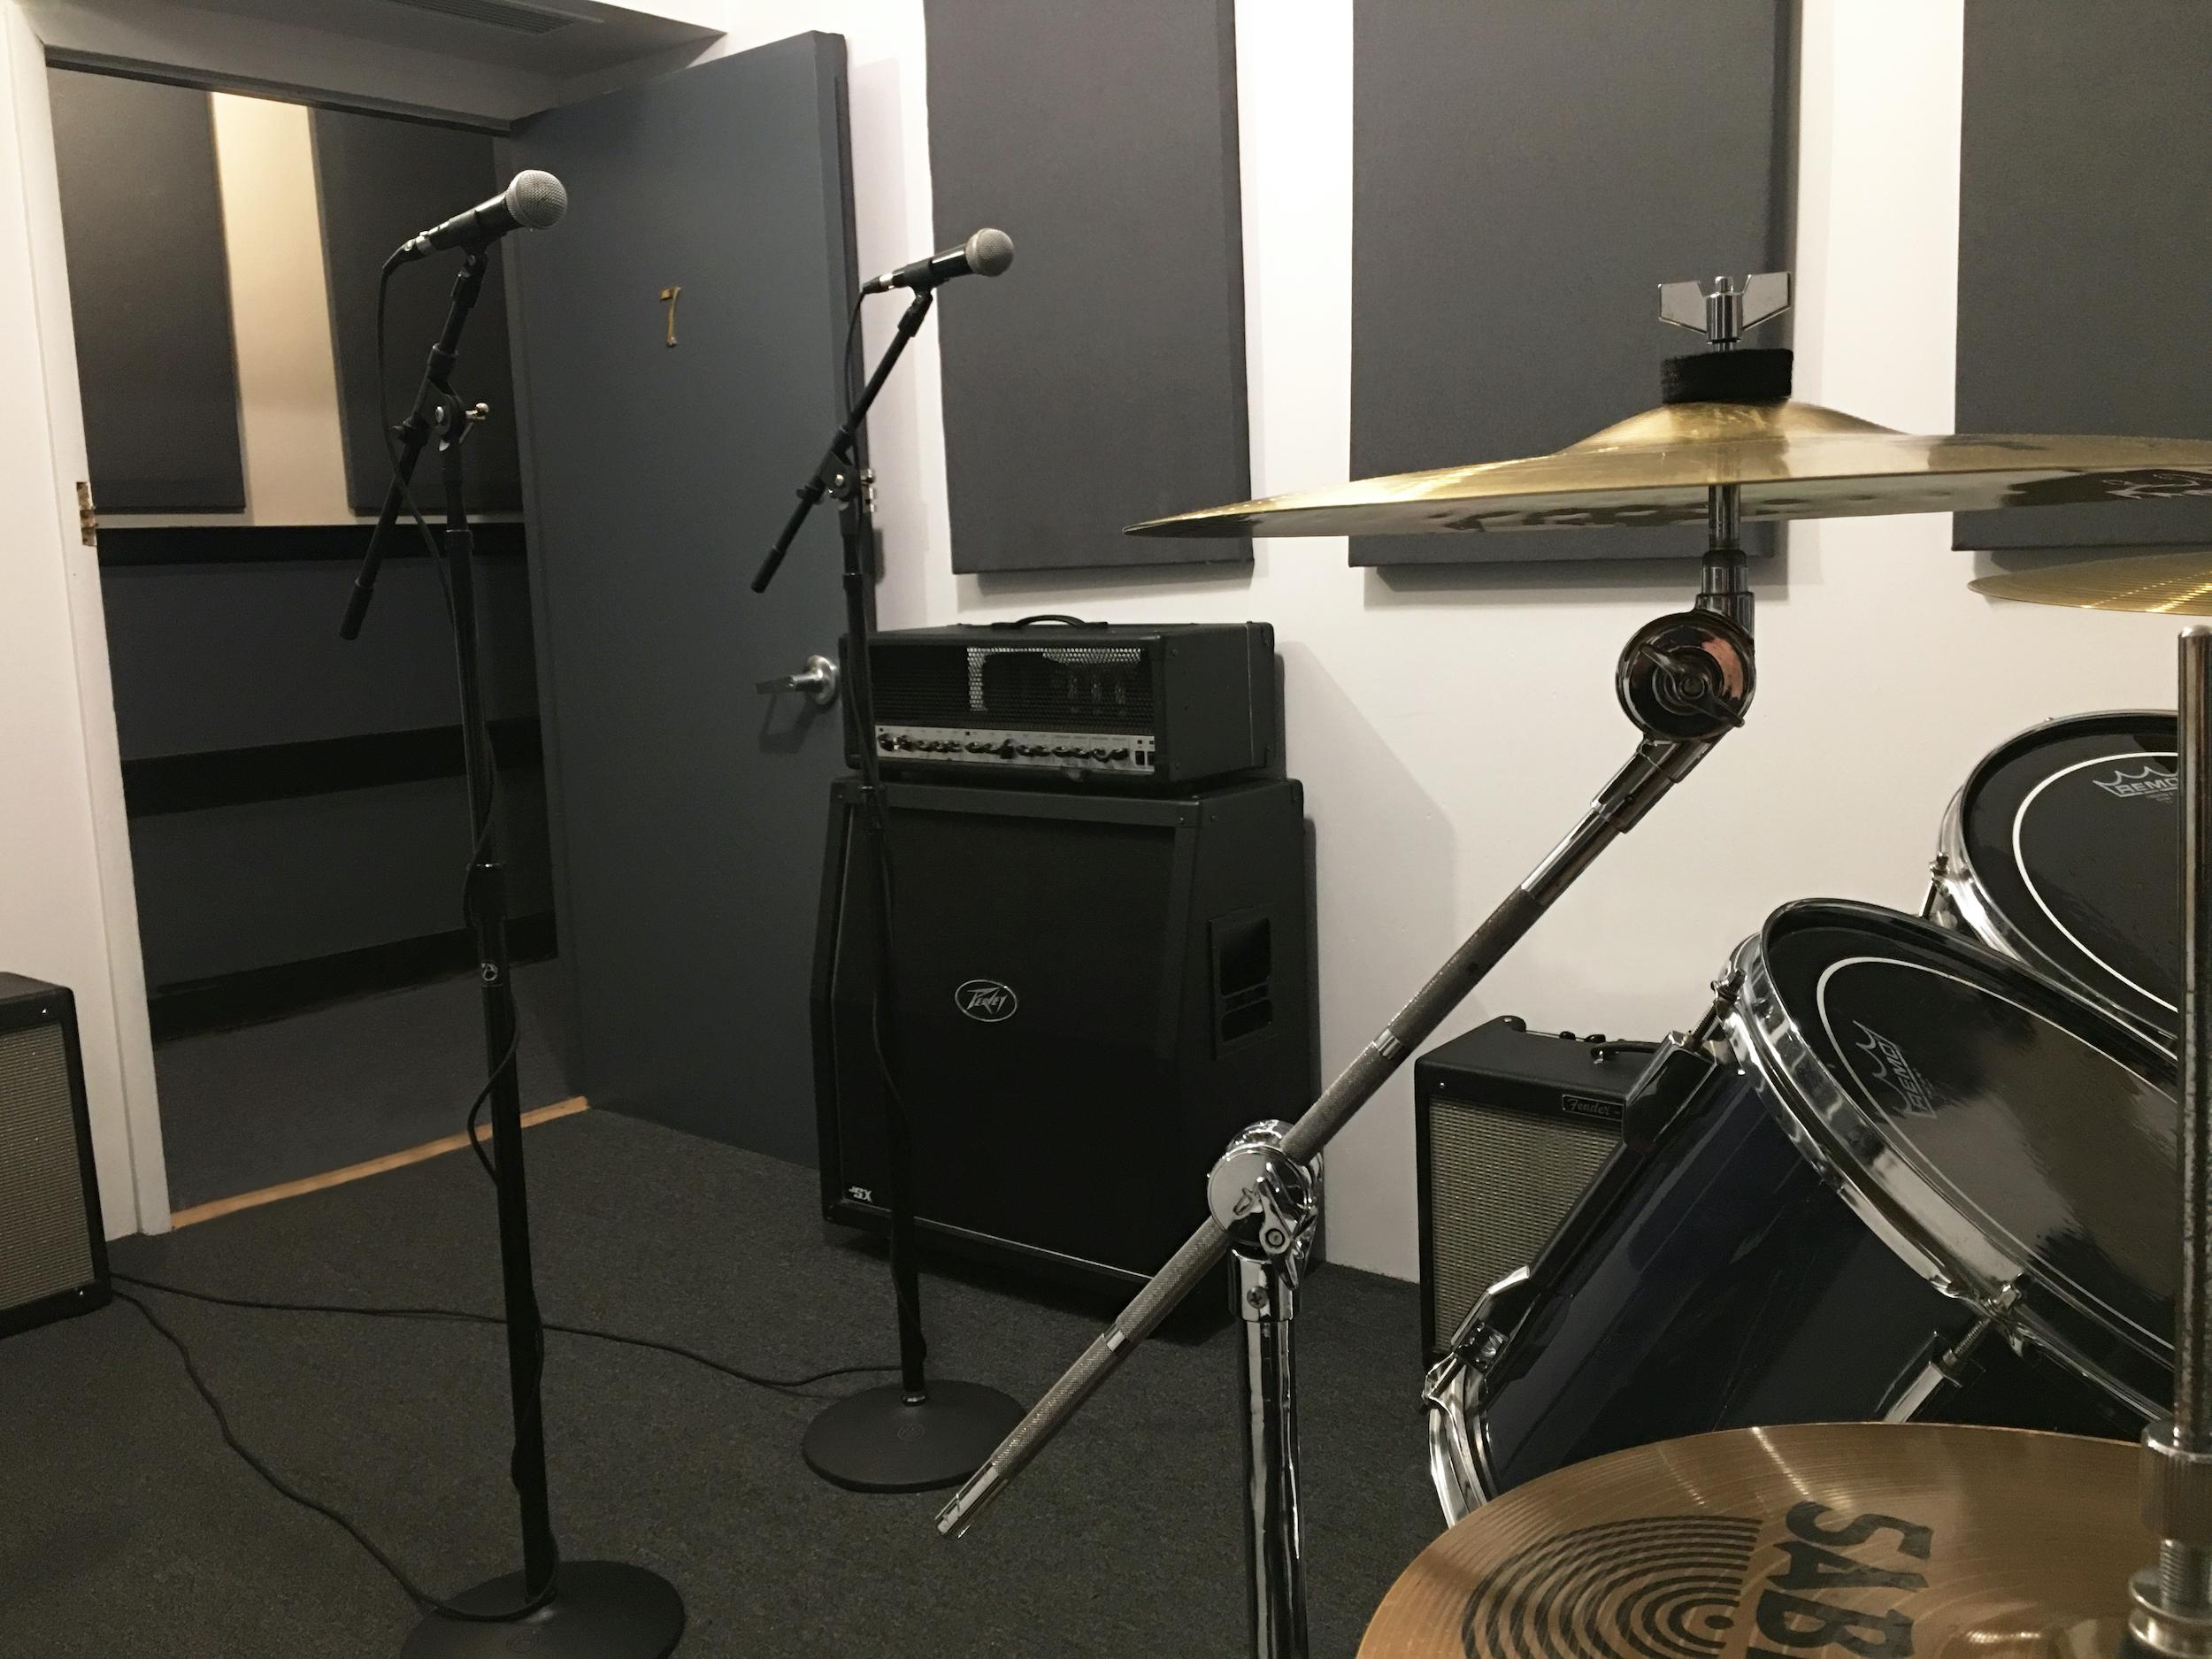 Rehearsal Studios NYC, Rehearsal Studios, Studio Rehearsal Space, Rehearsal Studios in NYC